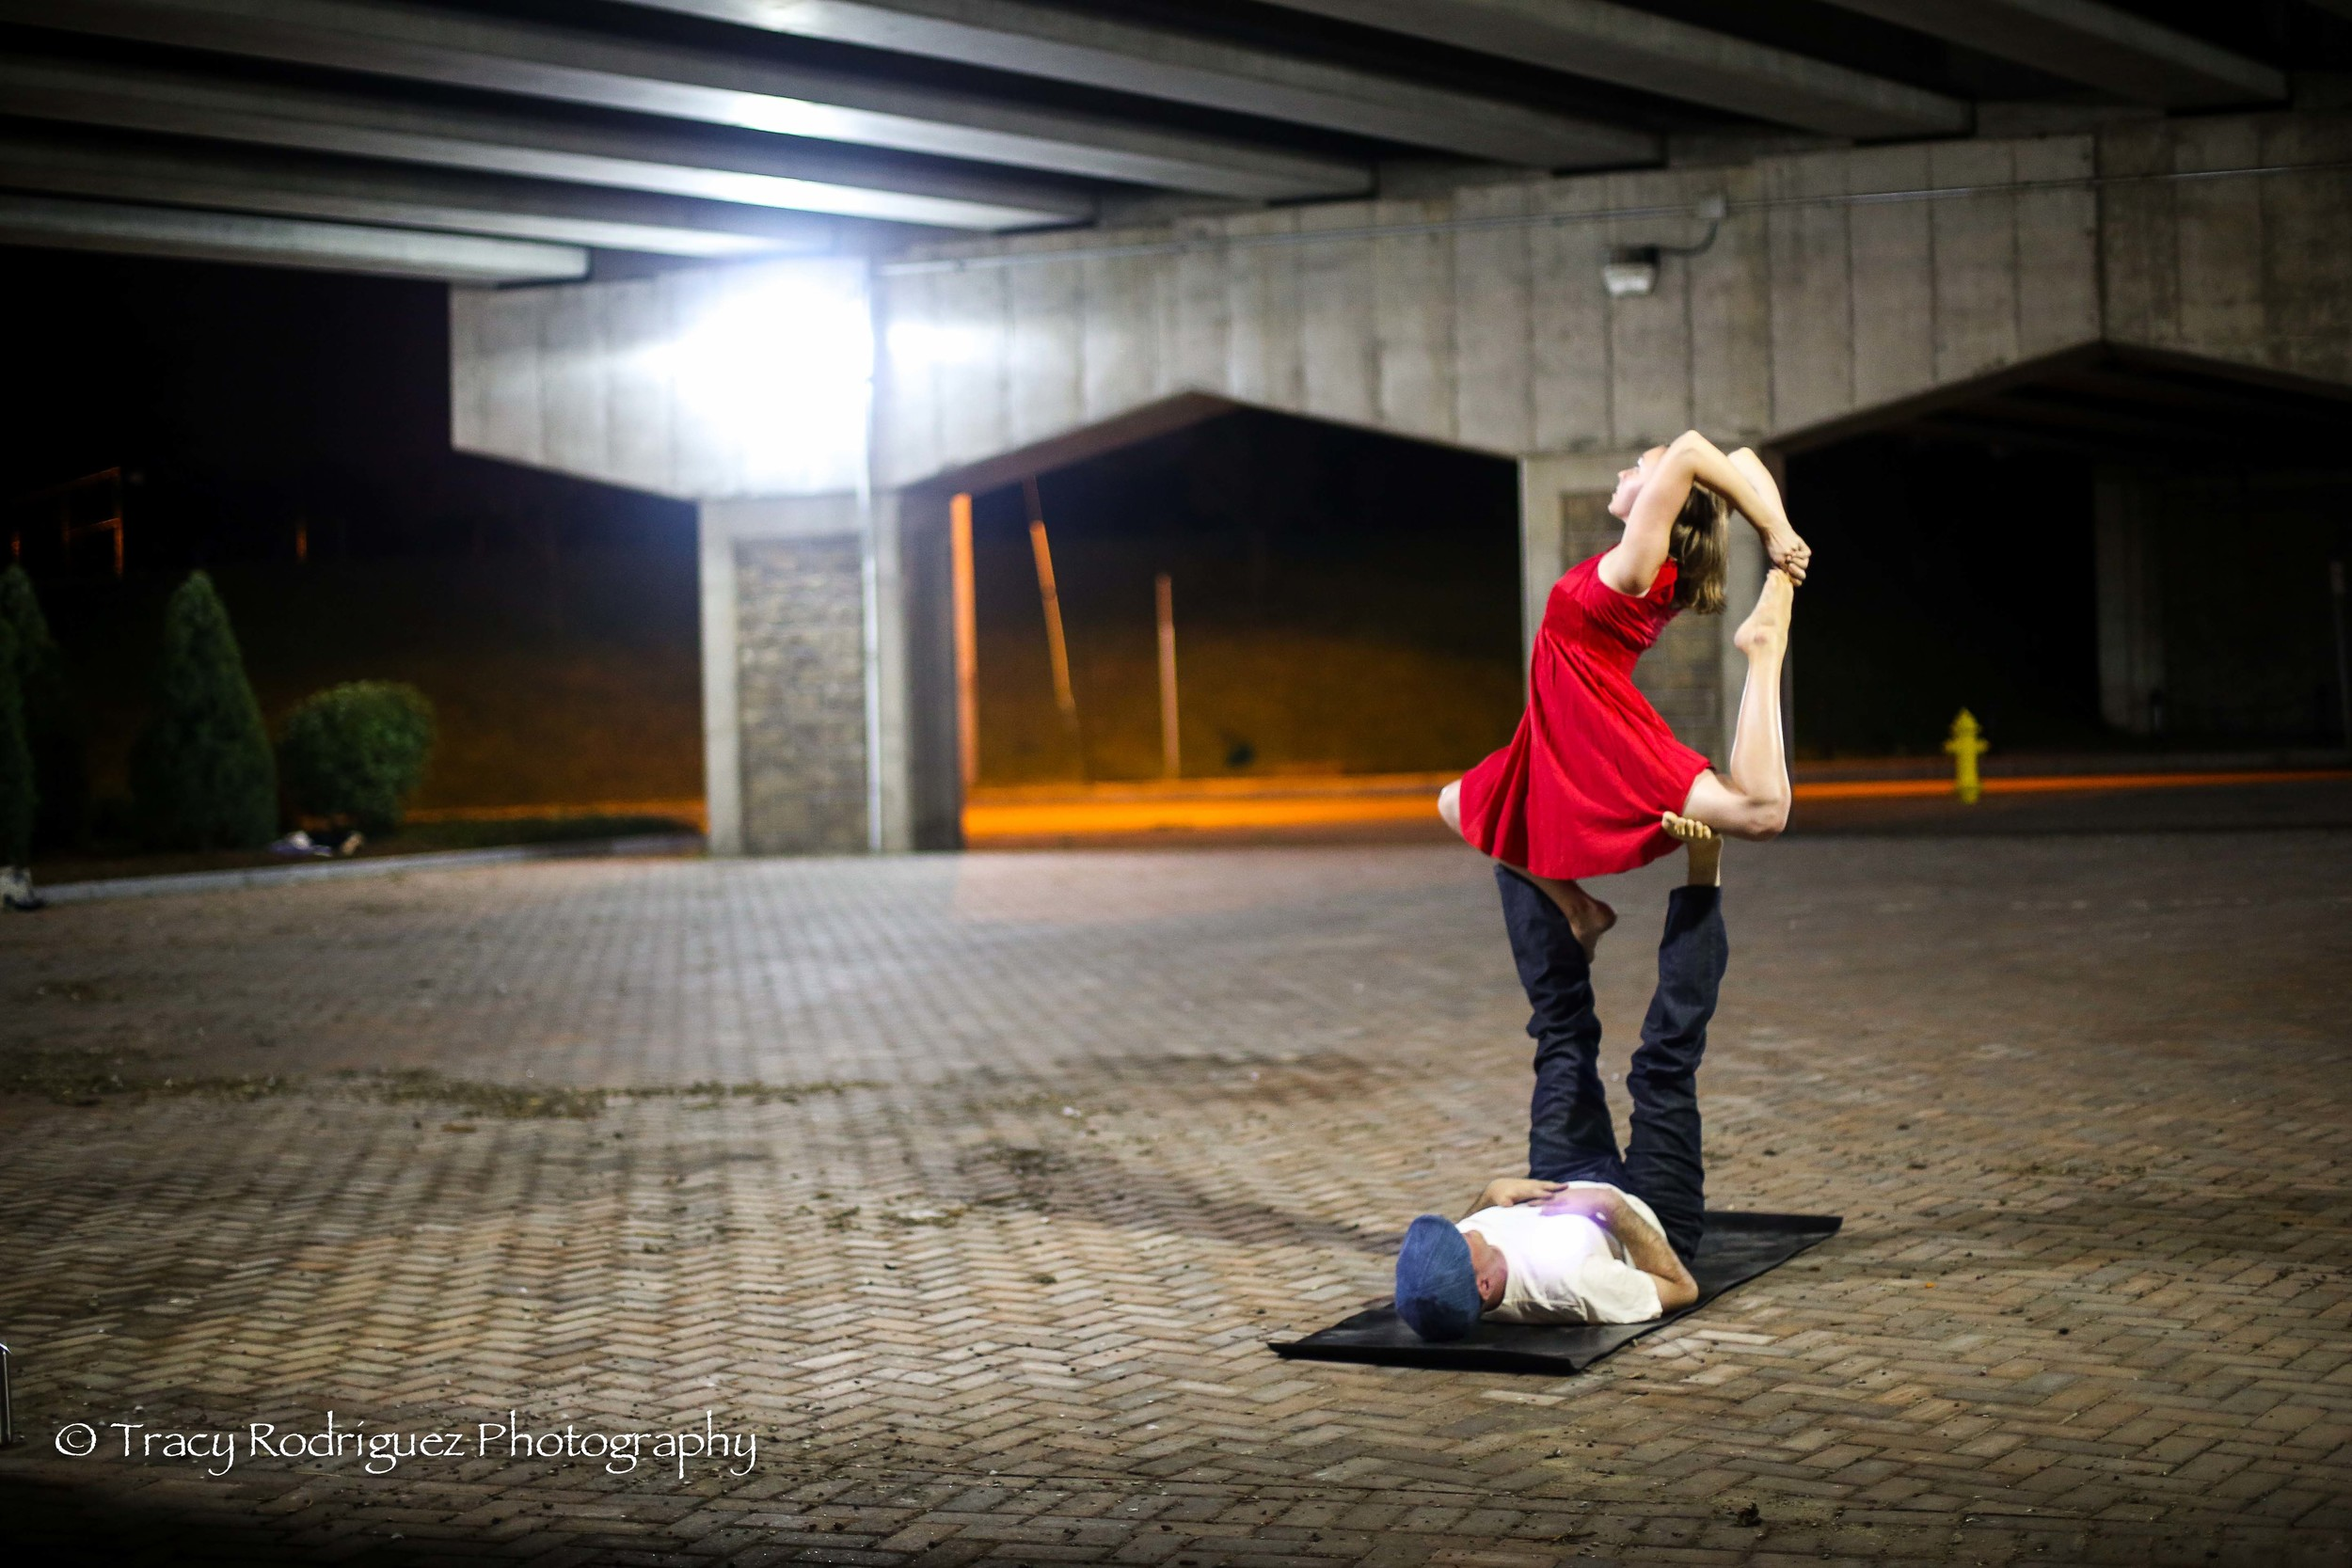 Tracy_Rodriguez_Photography_Blog-5376.jpg